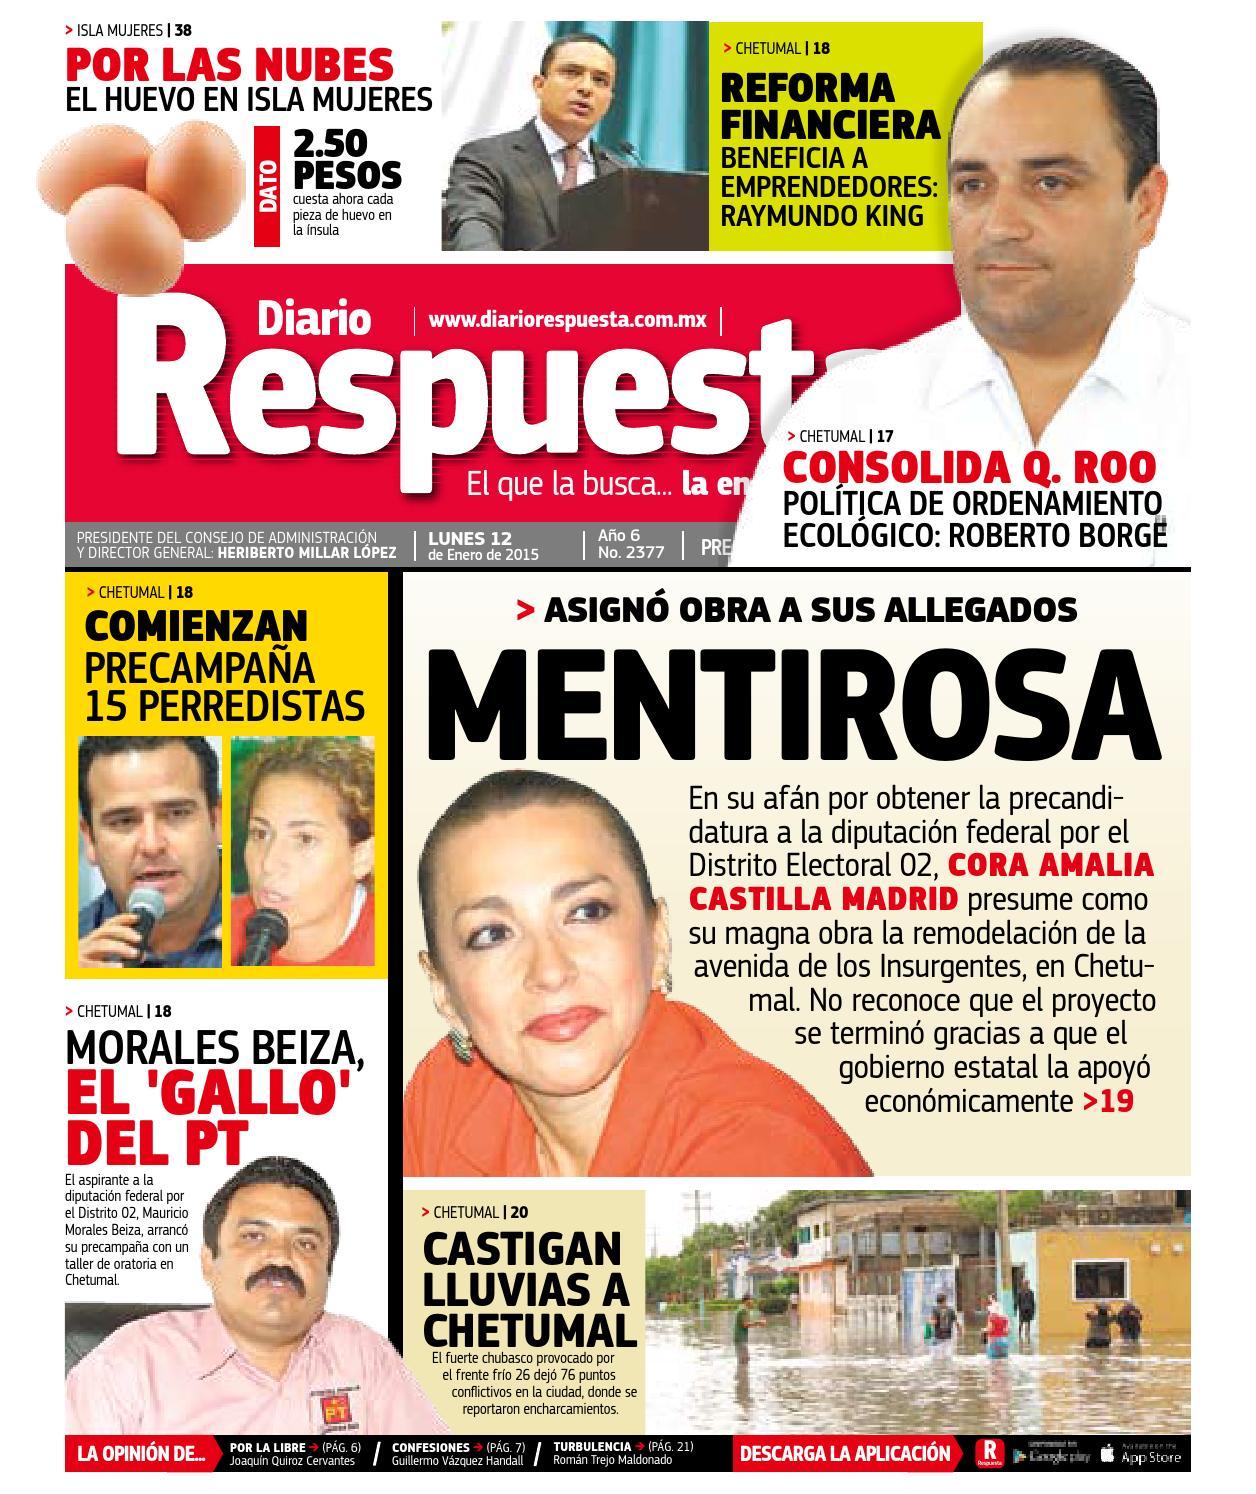 Respuesta 12 enero 2015 by Diario Respuesta - issuu 192ed4d405097